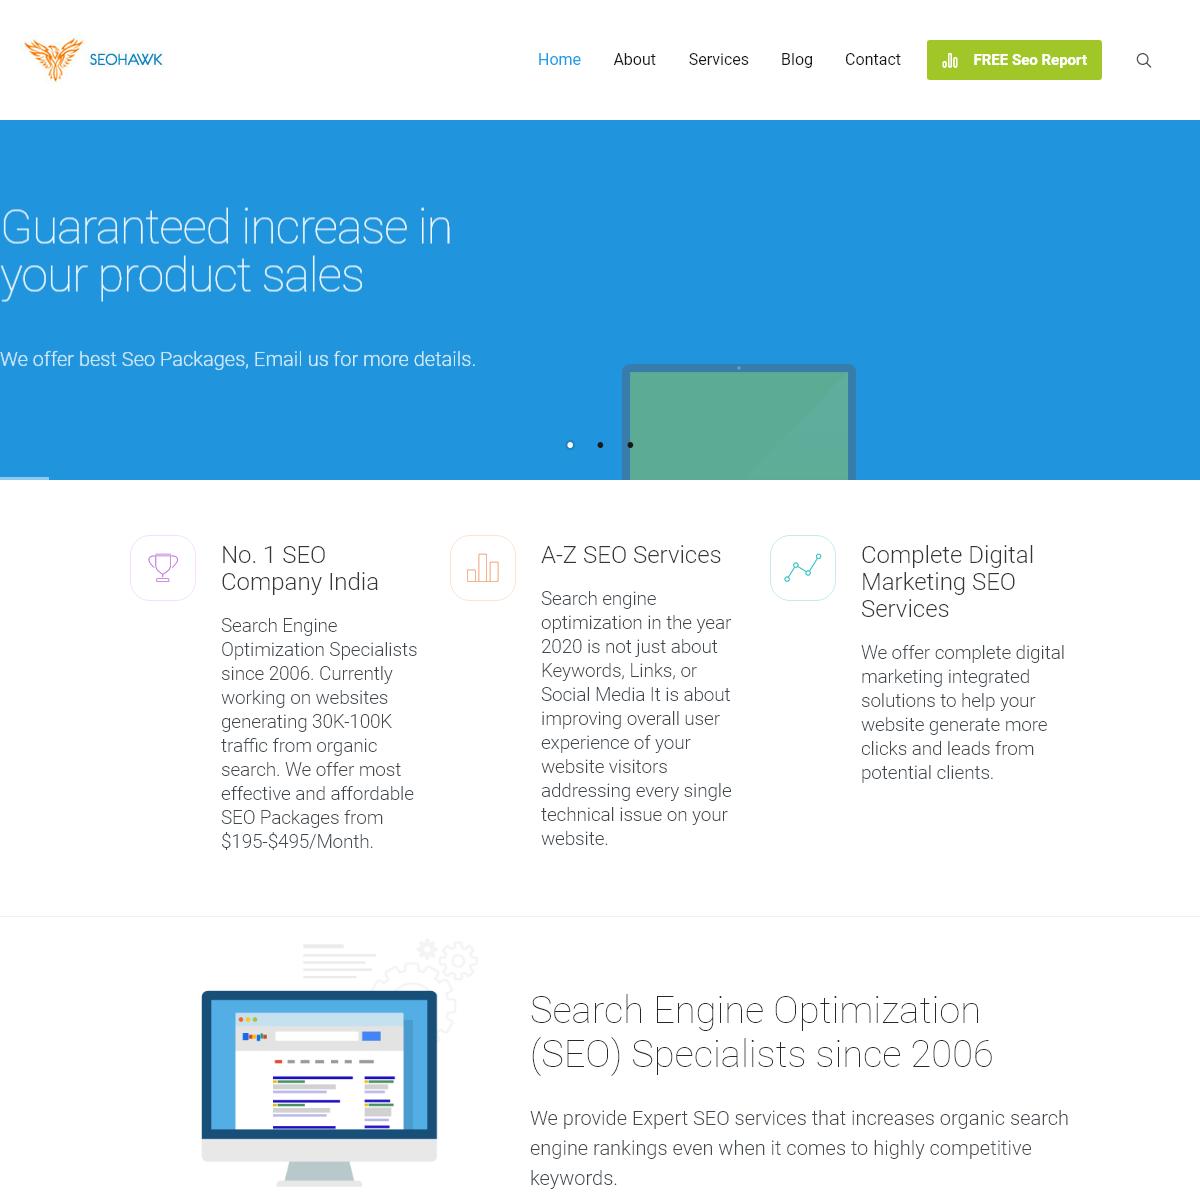 Search Engine Optimization (SEO) Company - SEOHAWK